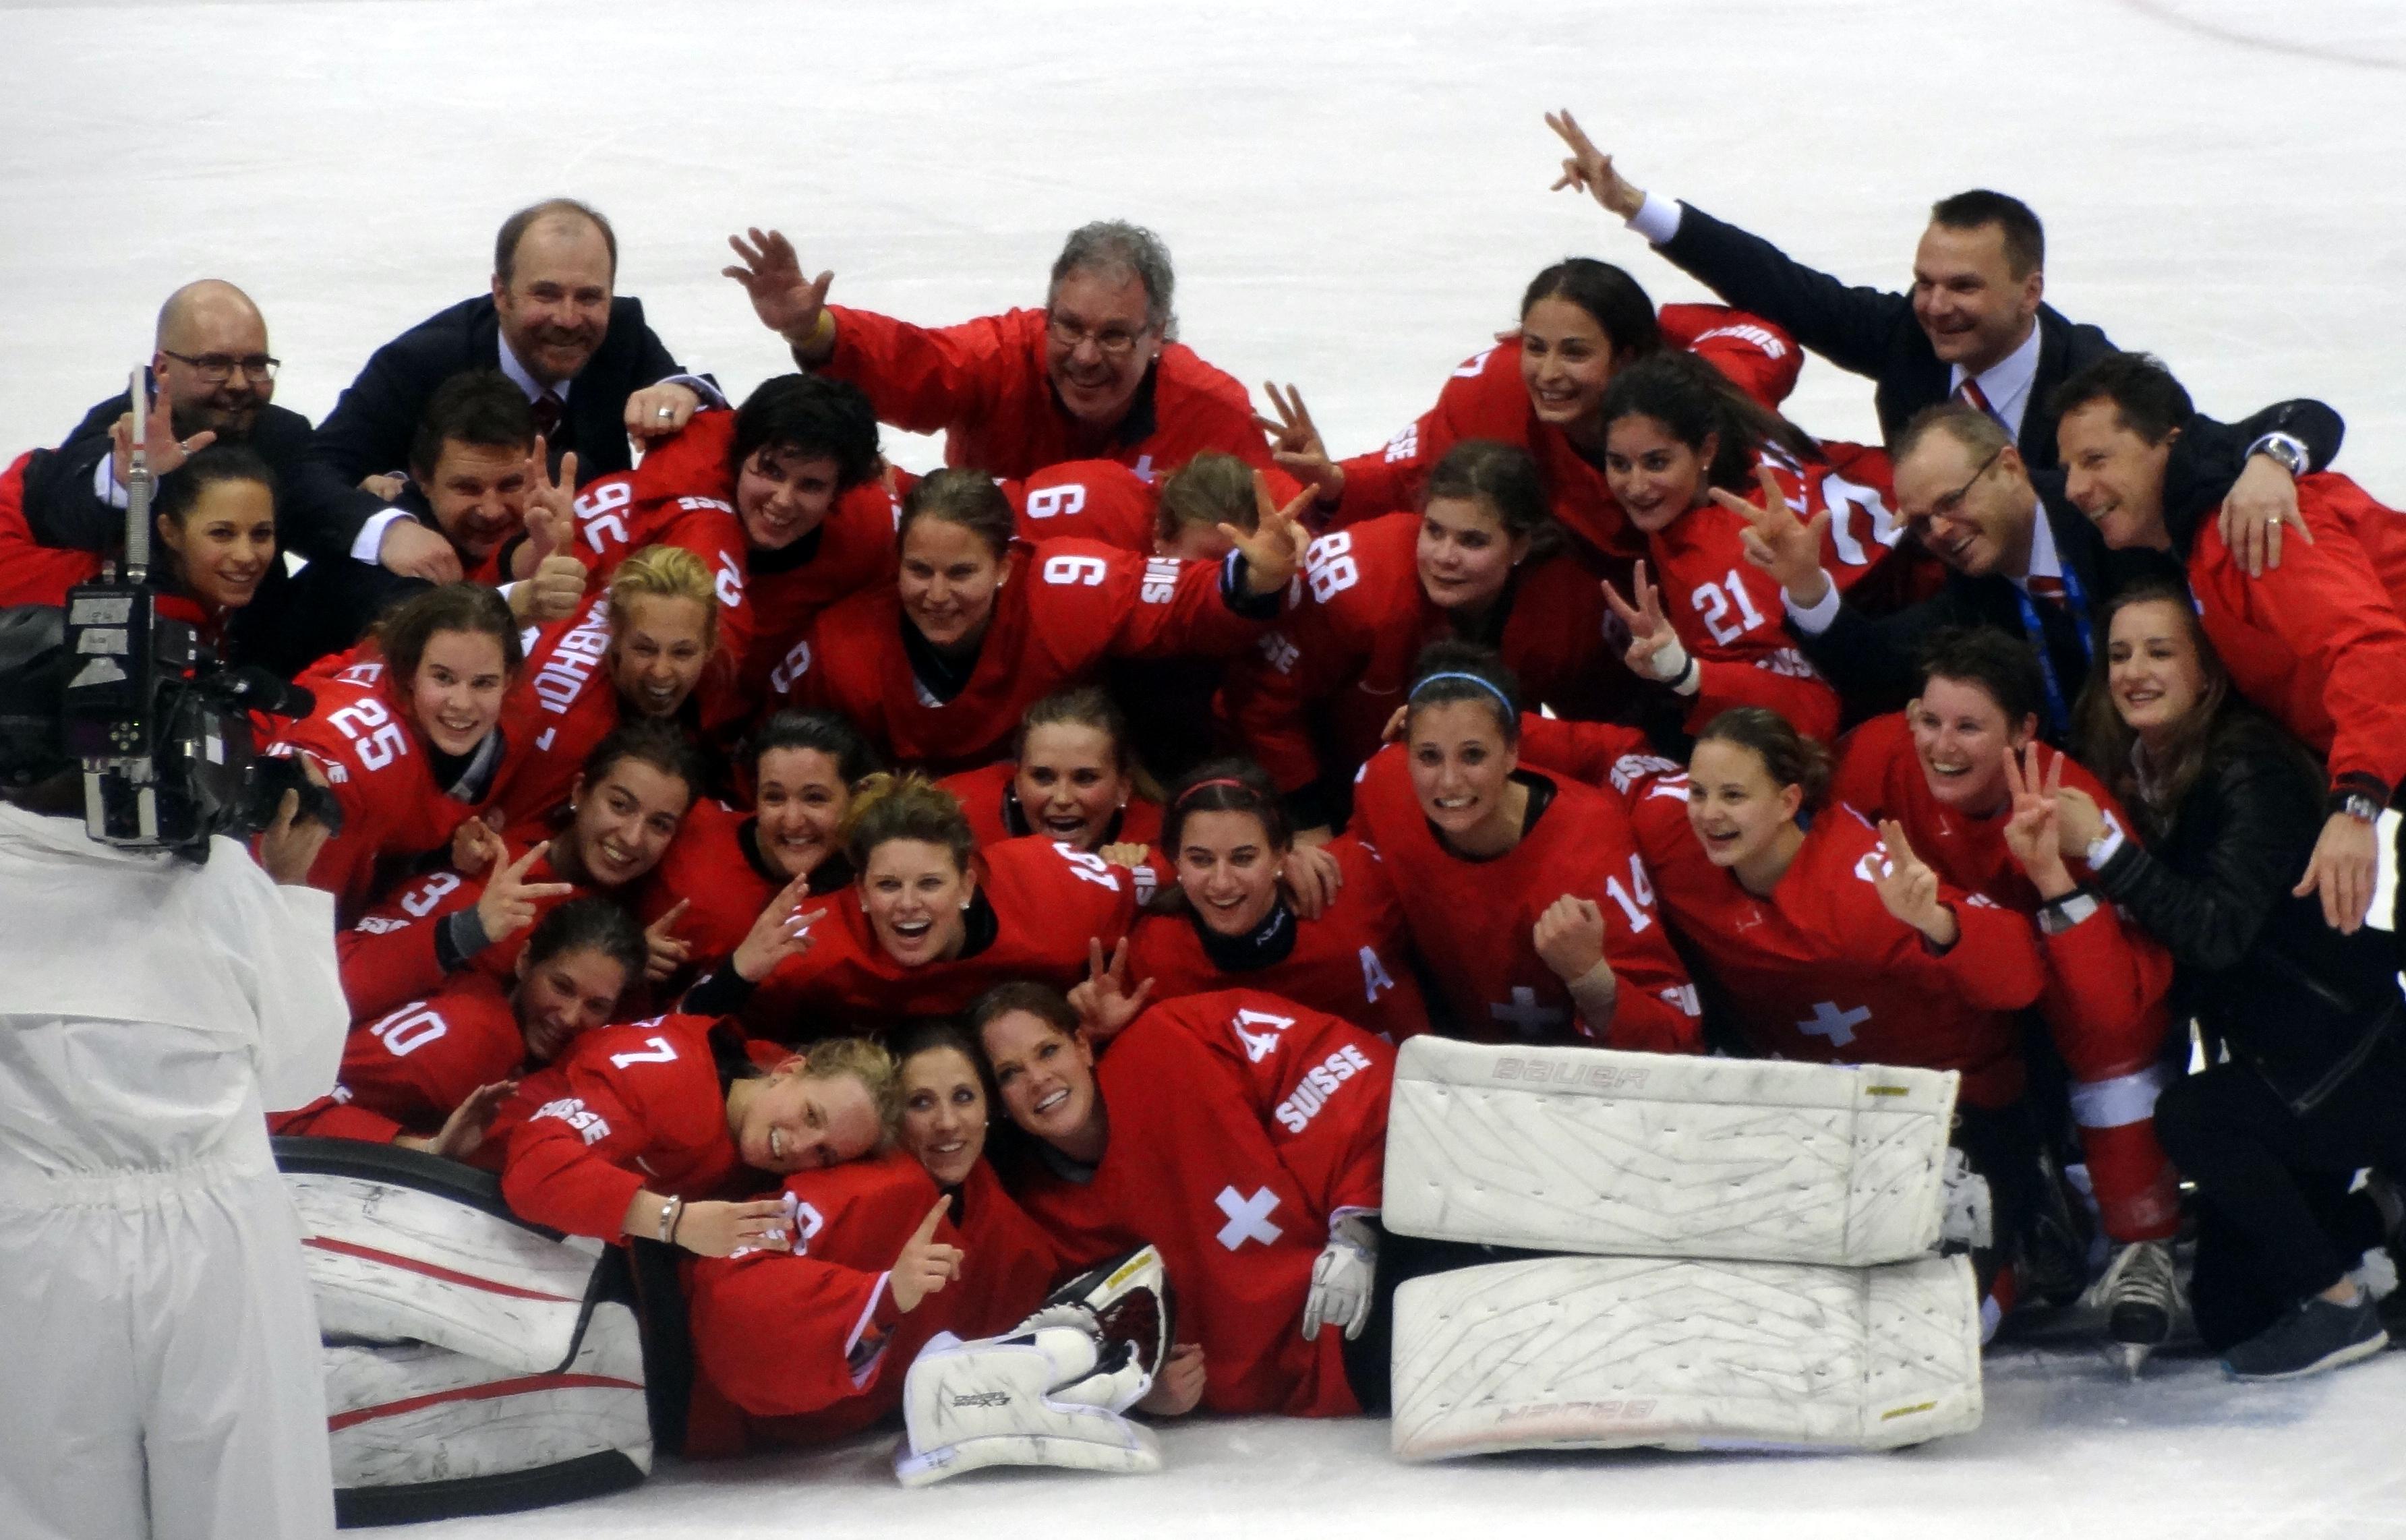 Sochi 2014: womens hockey: european goalies stand tall